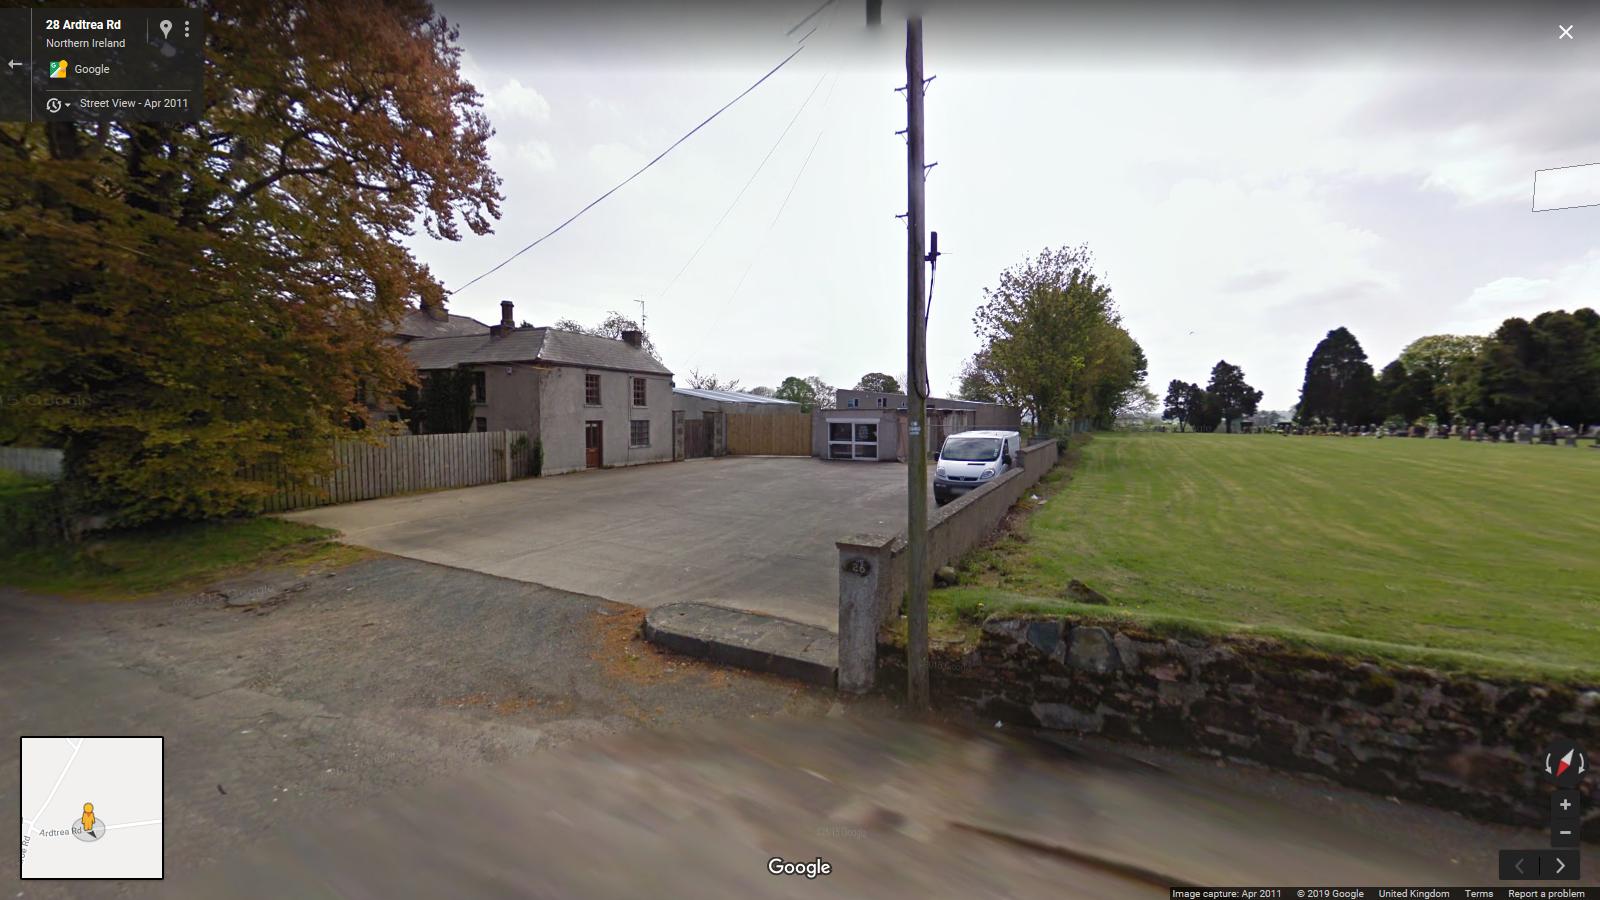 Junkyard Jewels - 28 Ardtrea Rd, Stewartstown - 2011 Google Streetview.png